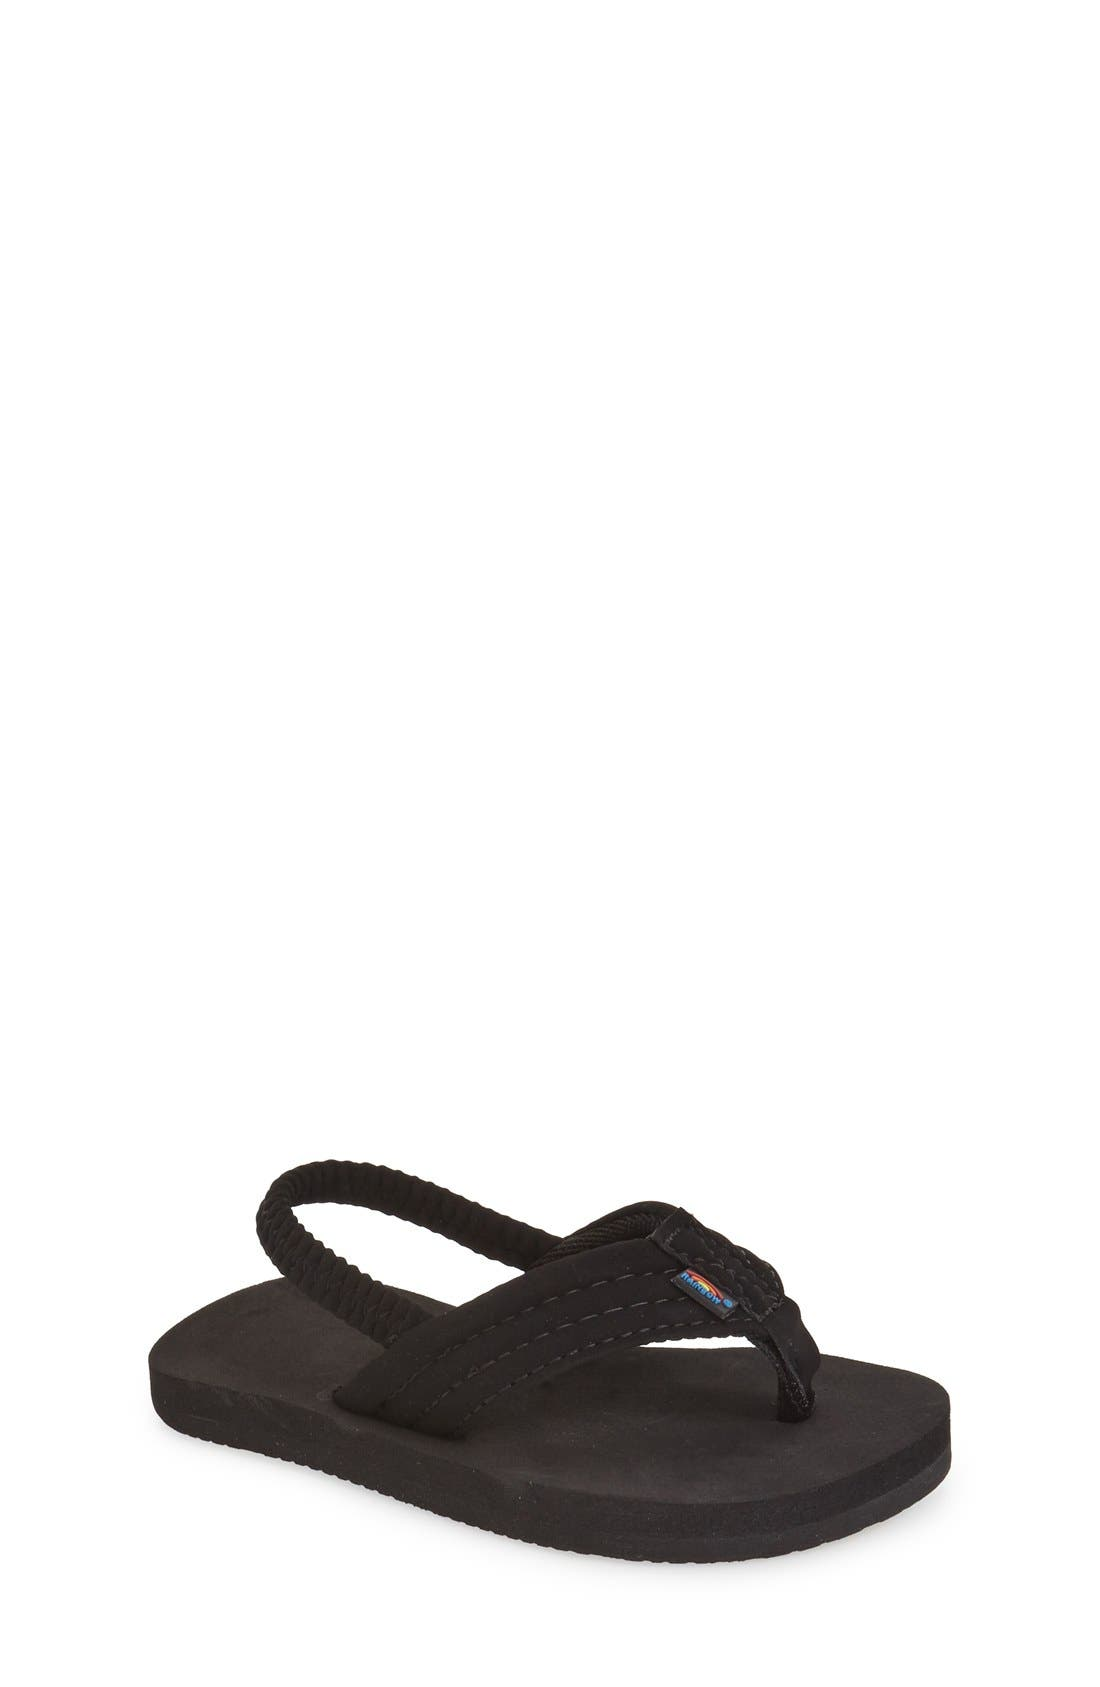 Black rainbow sandals with crystals - Black Rainbow Sandals With Crystals 21